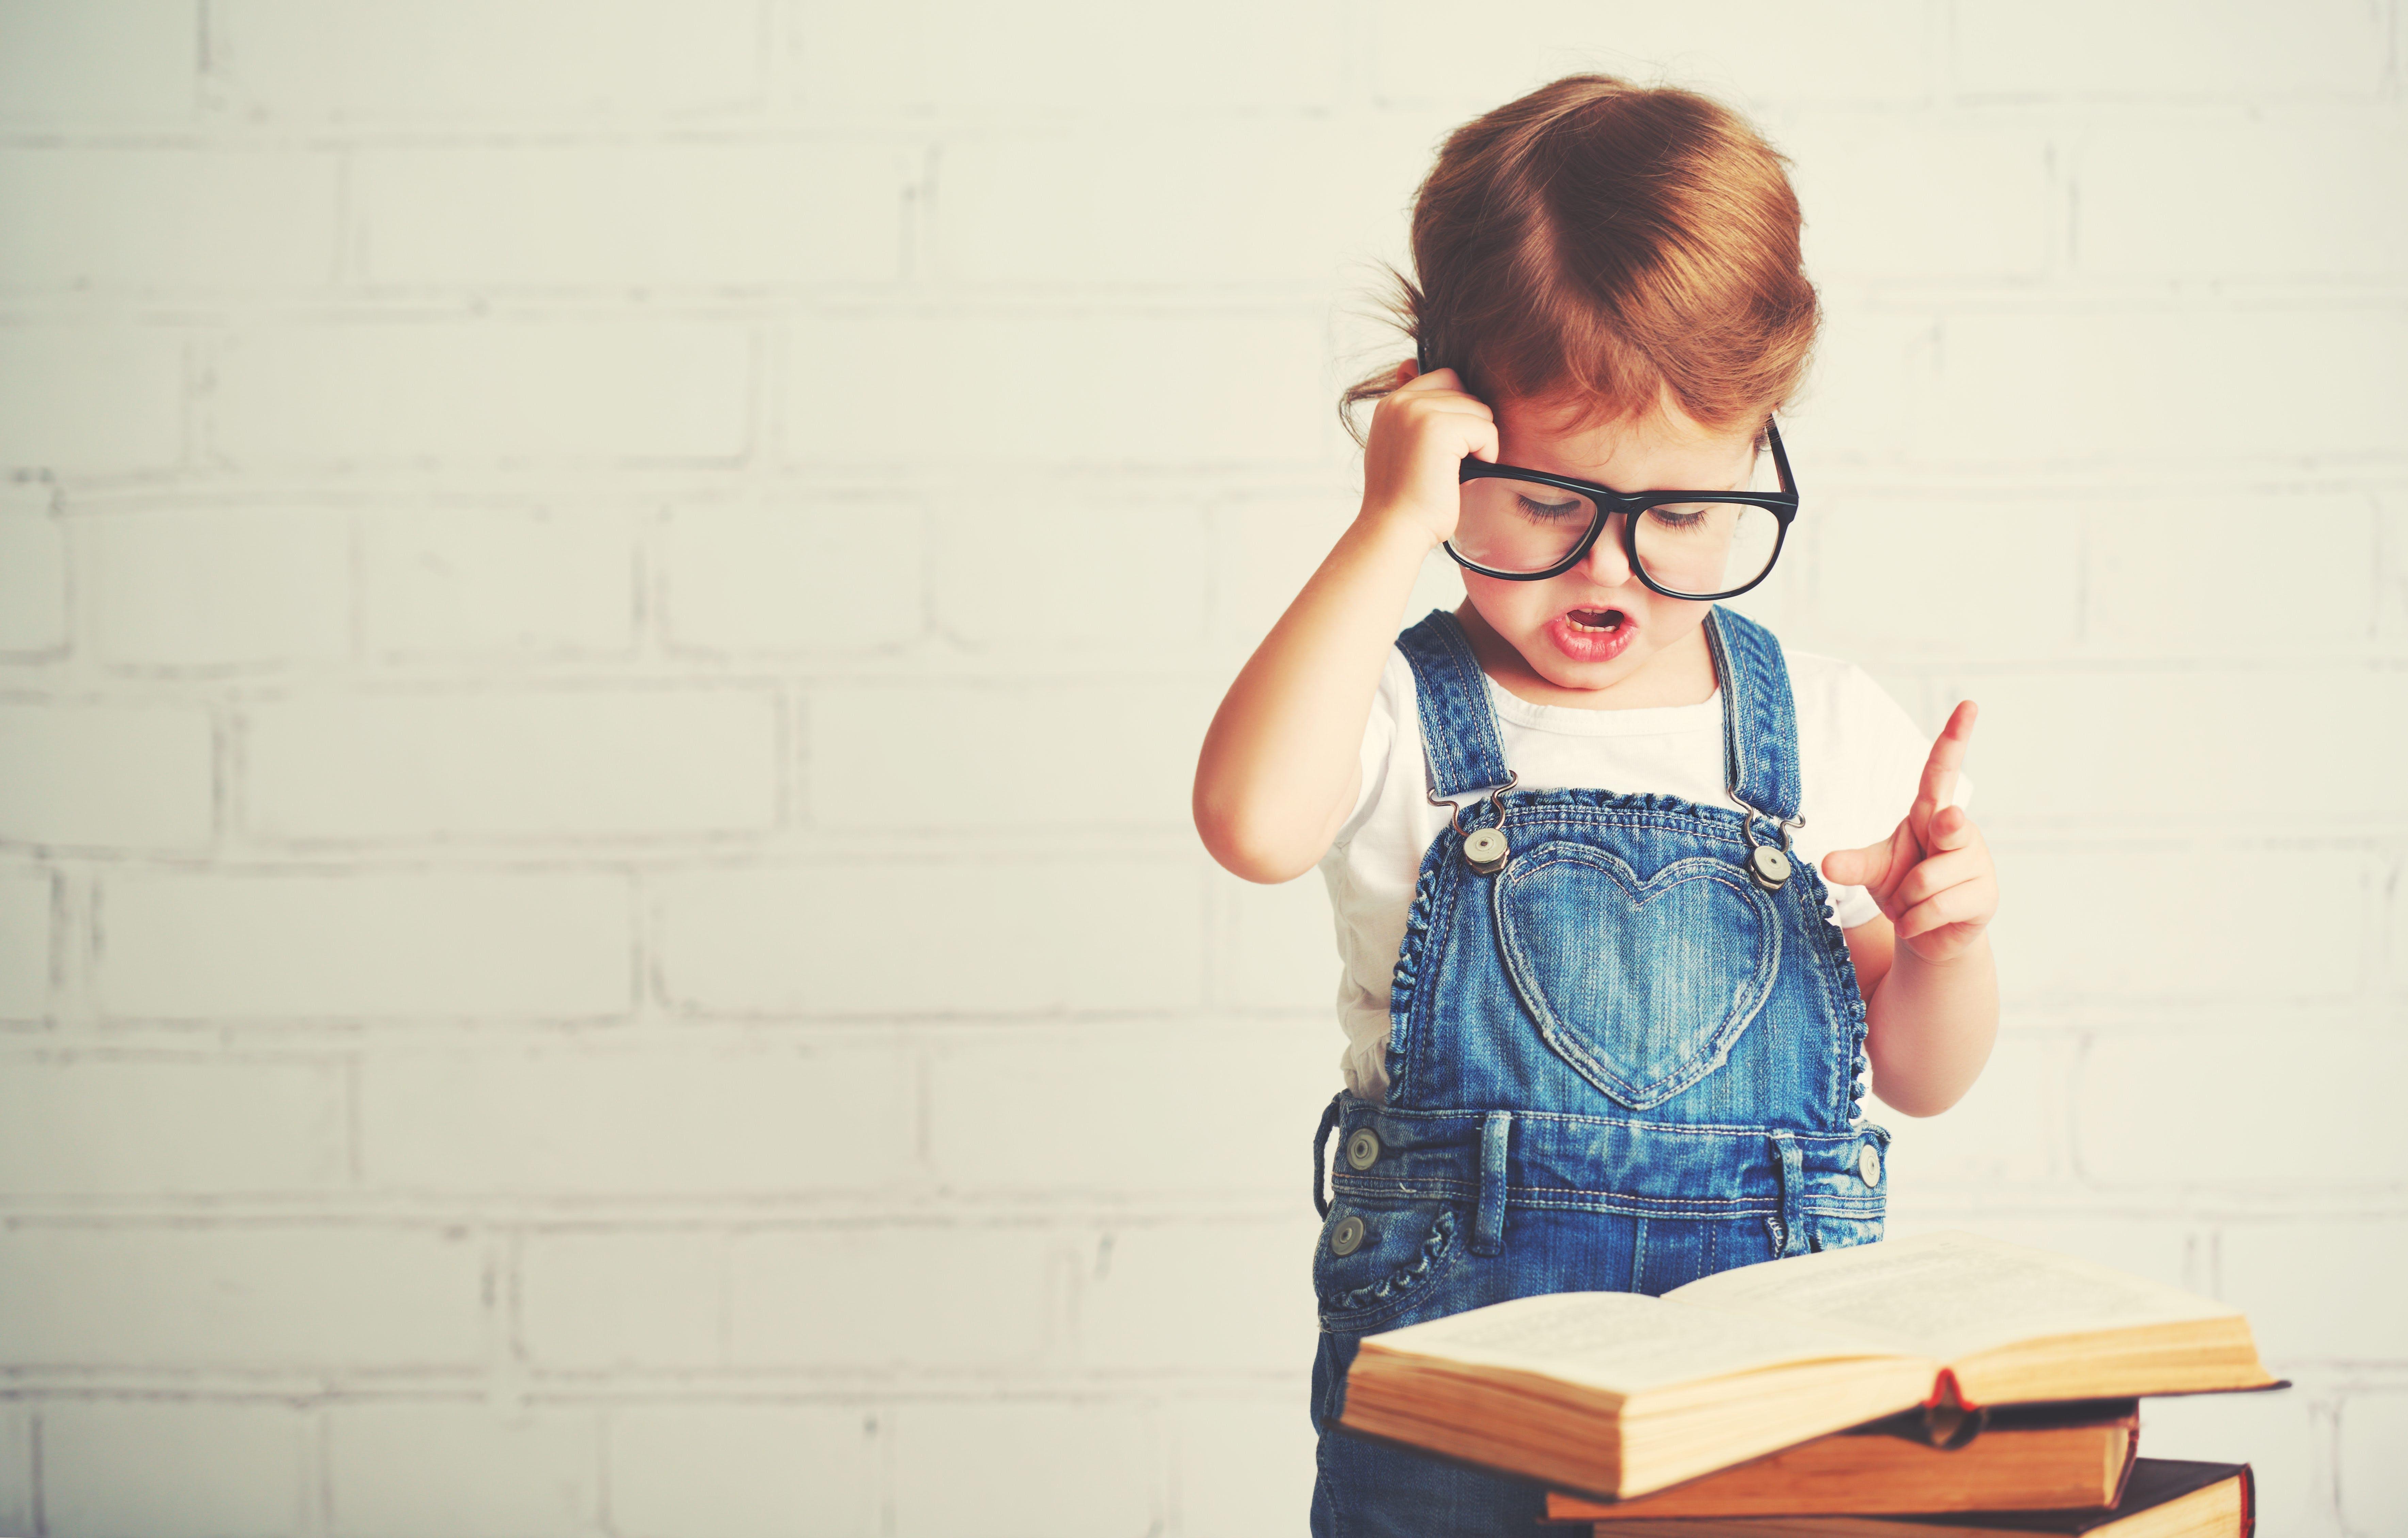 New study: kids with epilepsy get smarter on keto